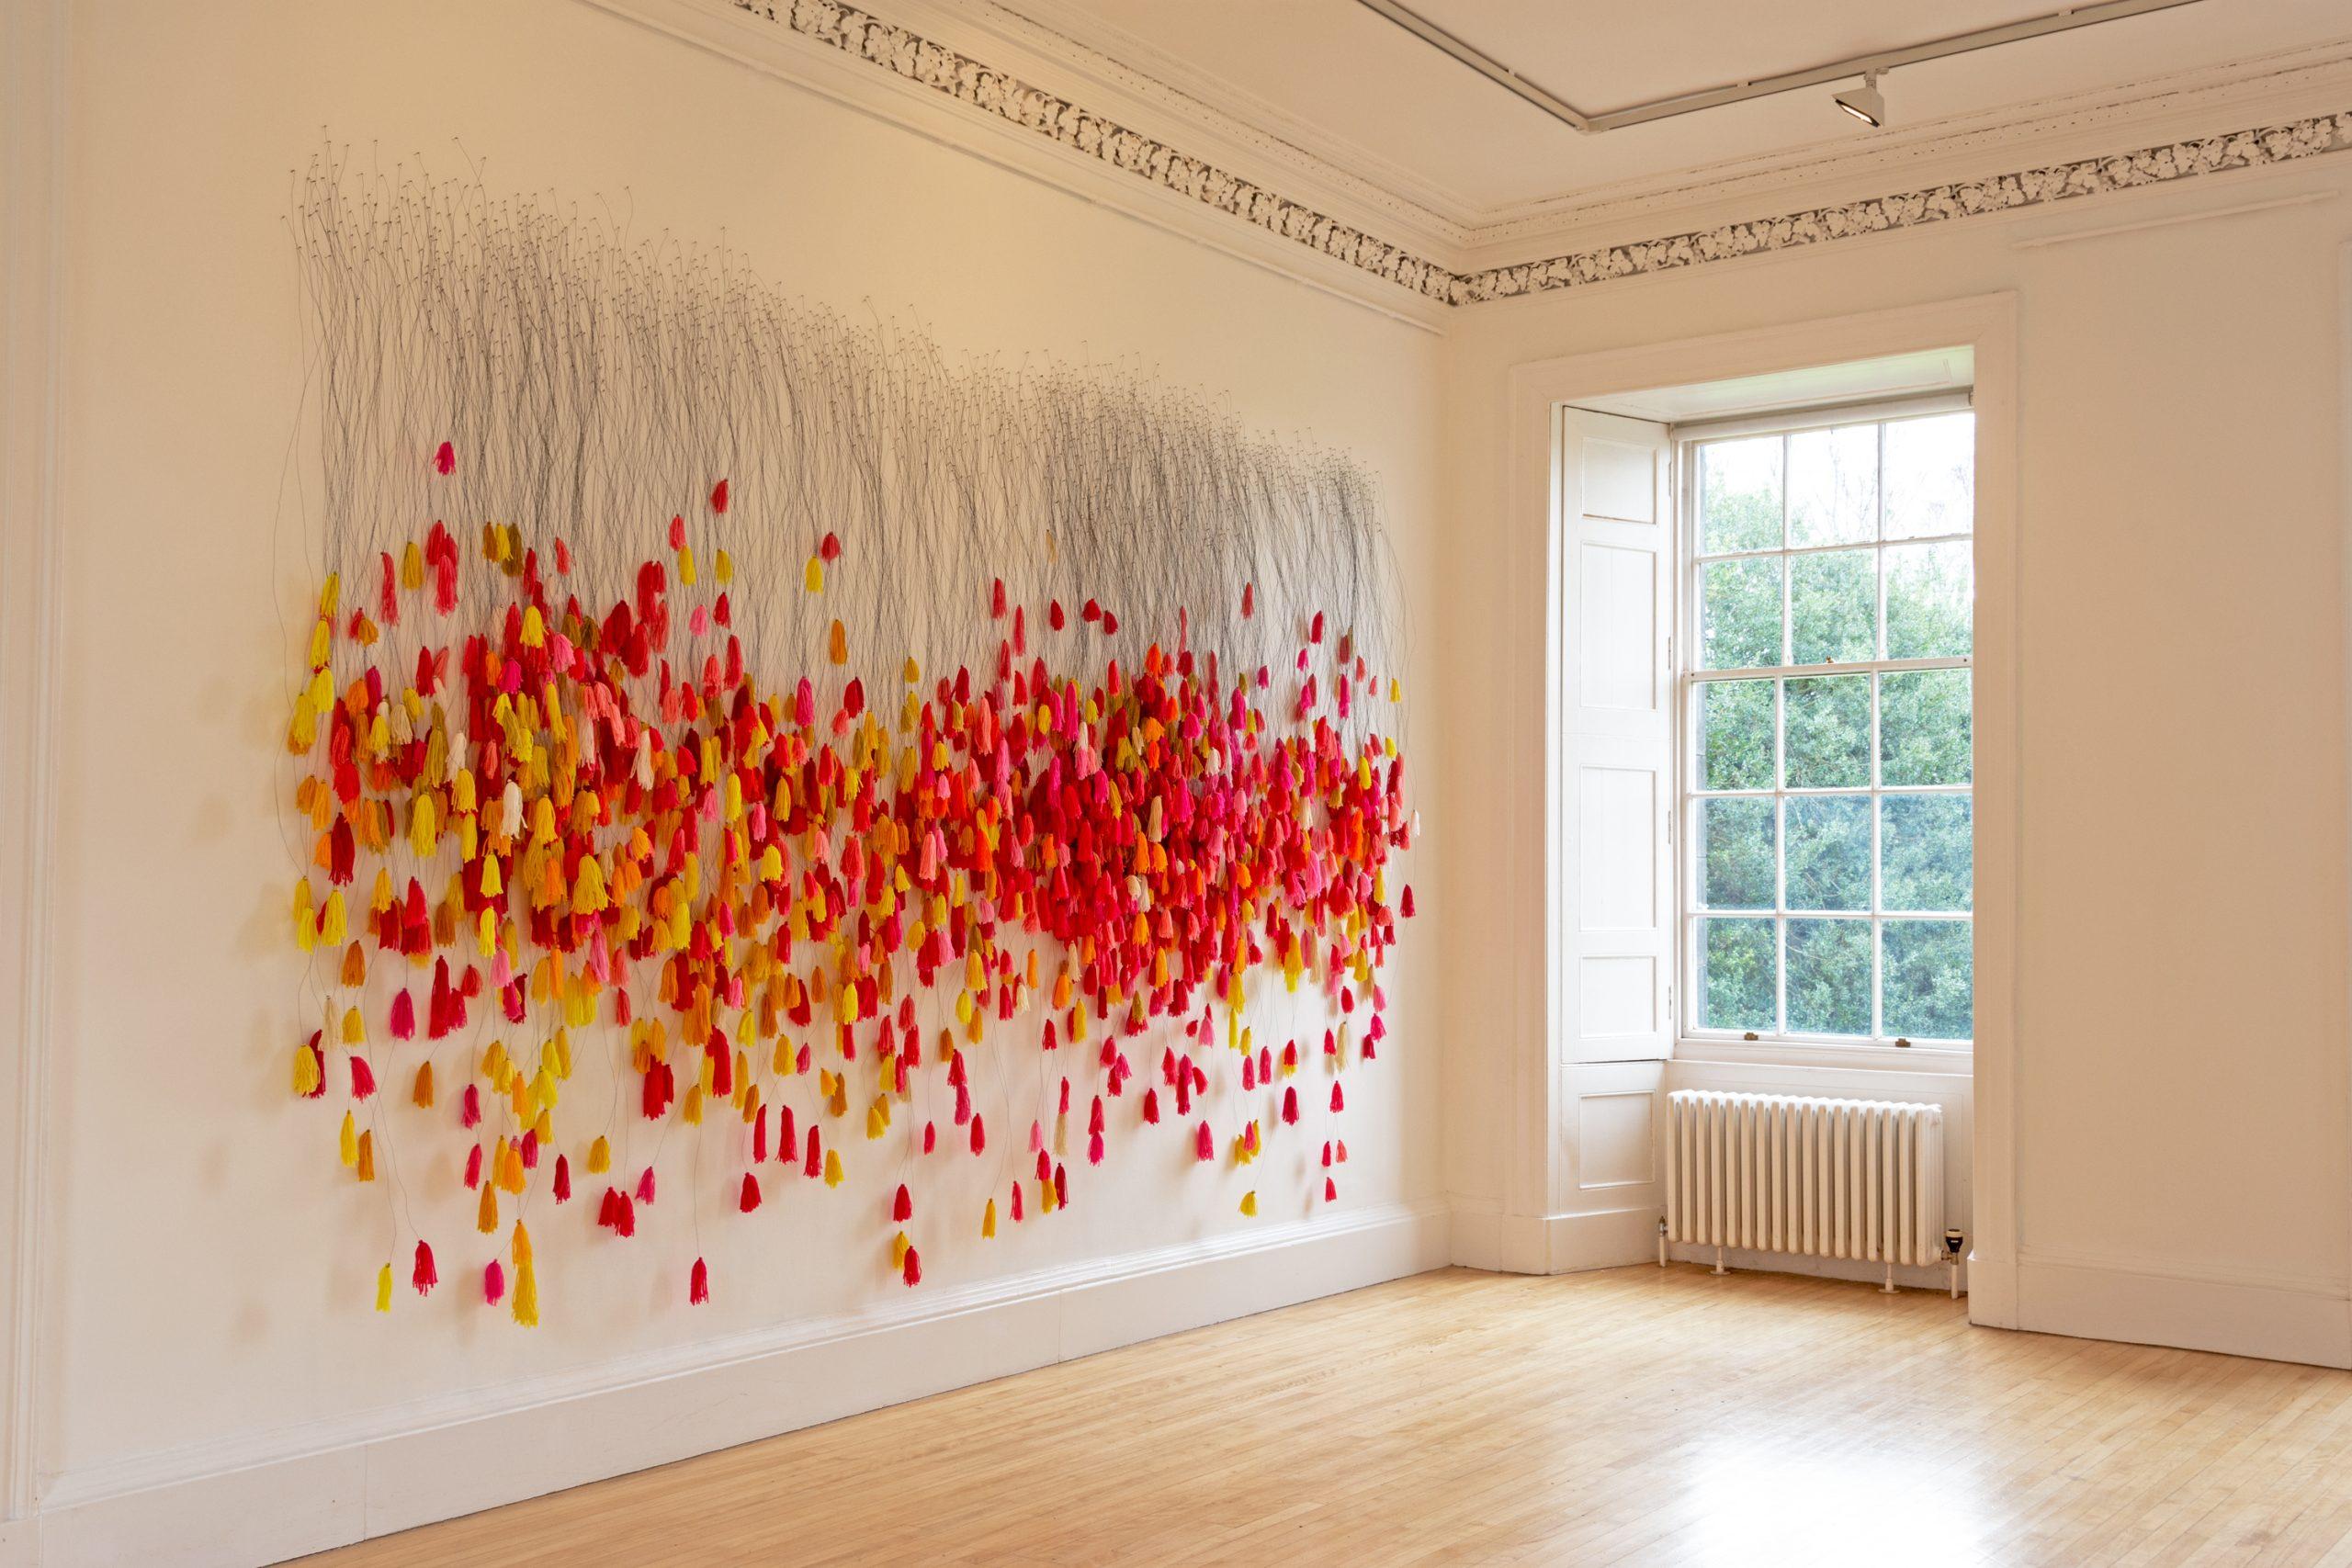 2021 Cordis Prize for Tapestry